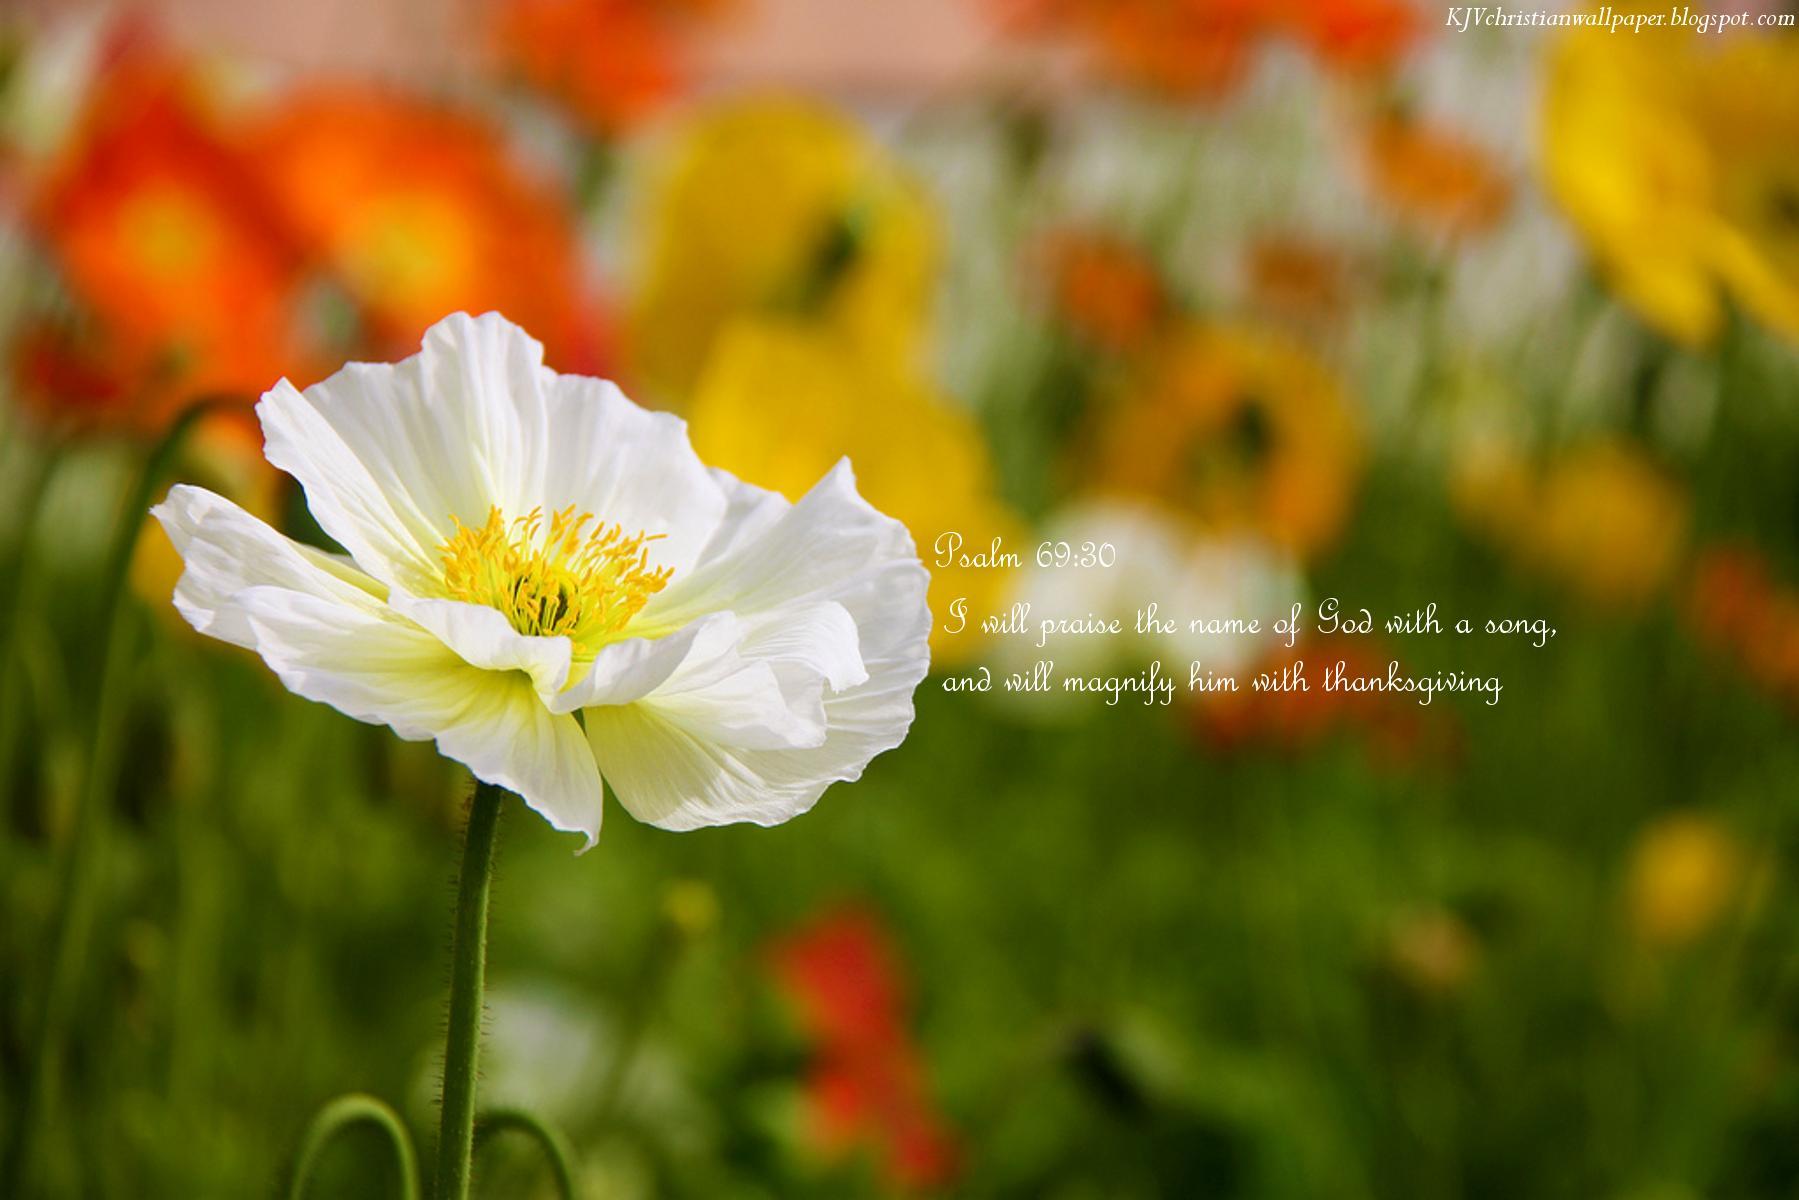 King Name Wallpaper - Christian Desktop Backgrounds Spring , HD Wallpaper & Backgrounds